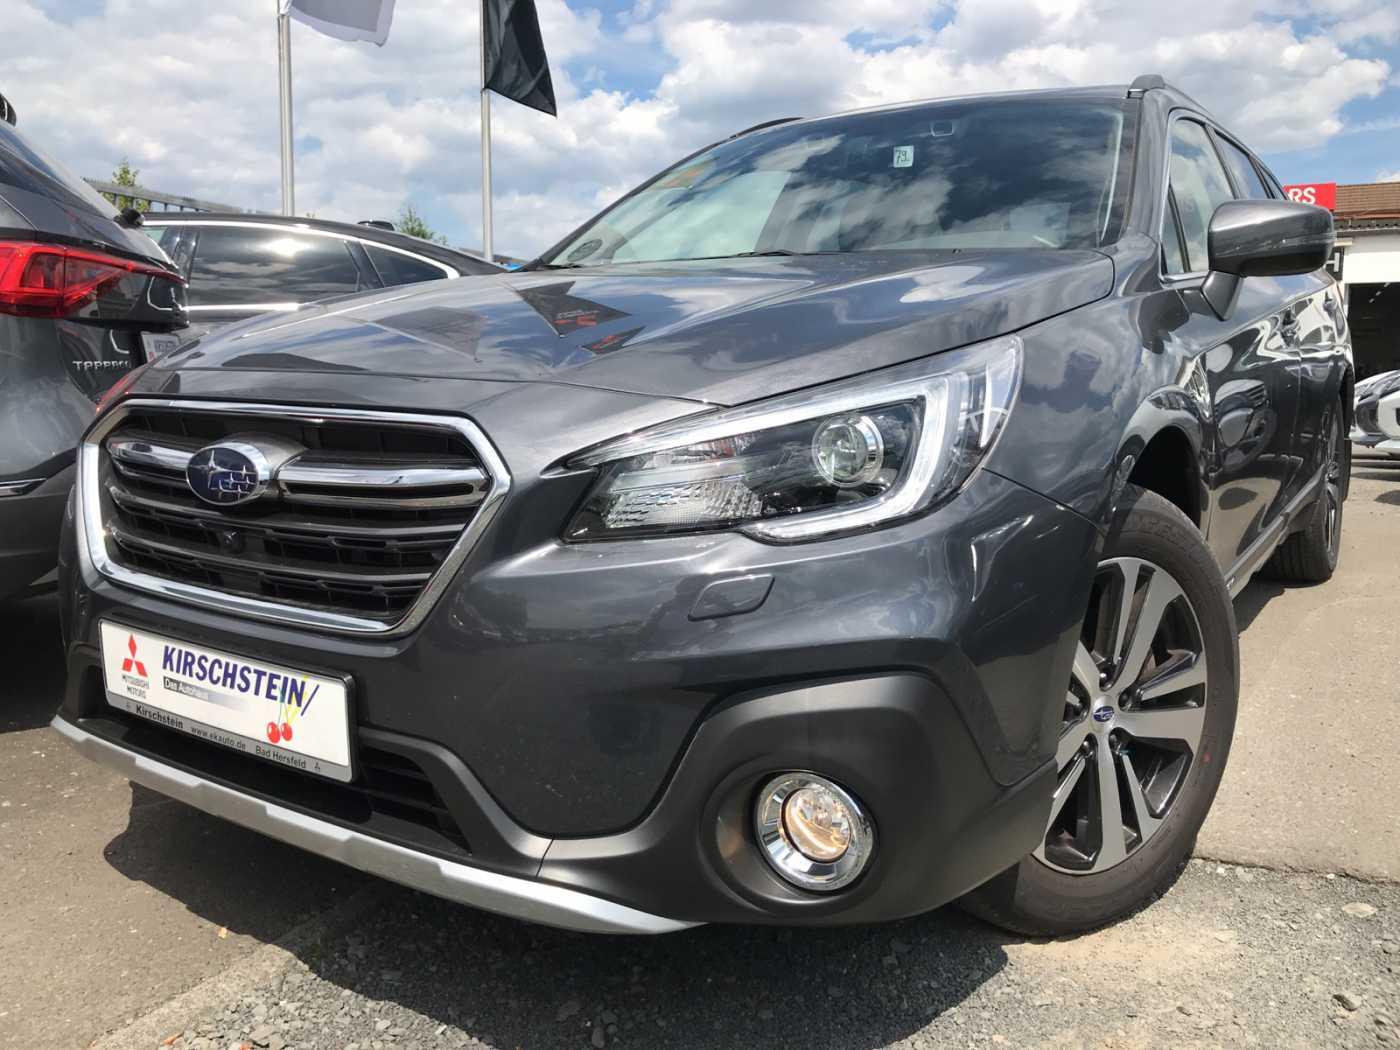 Subaru Outback 2.5i Lineartronic Sport AHK Leder Navi Kamera, Jahr 2020, Benzin